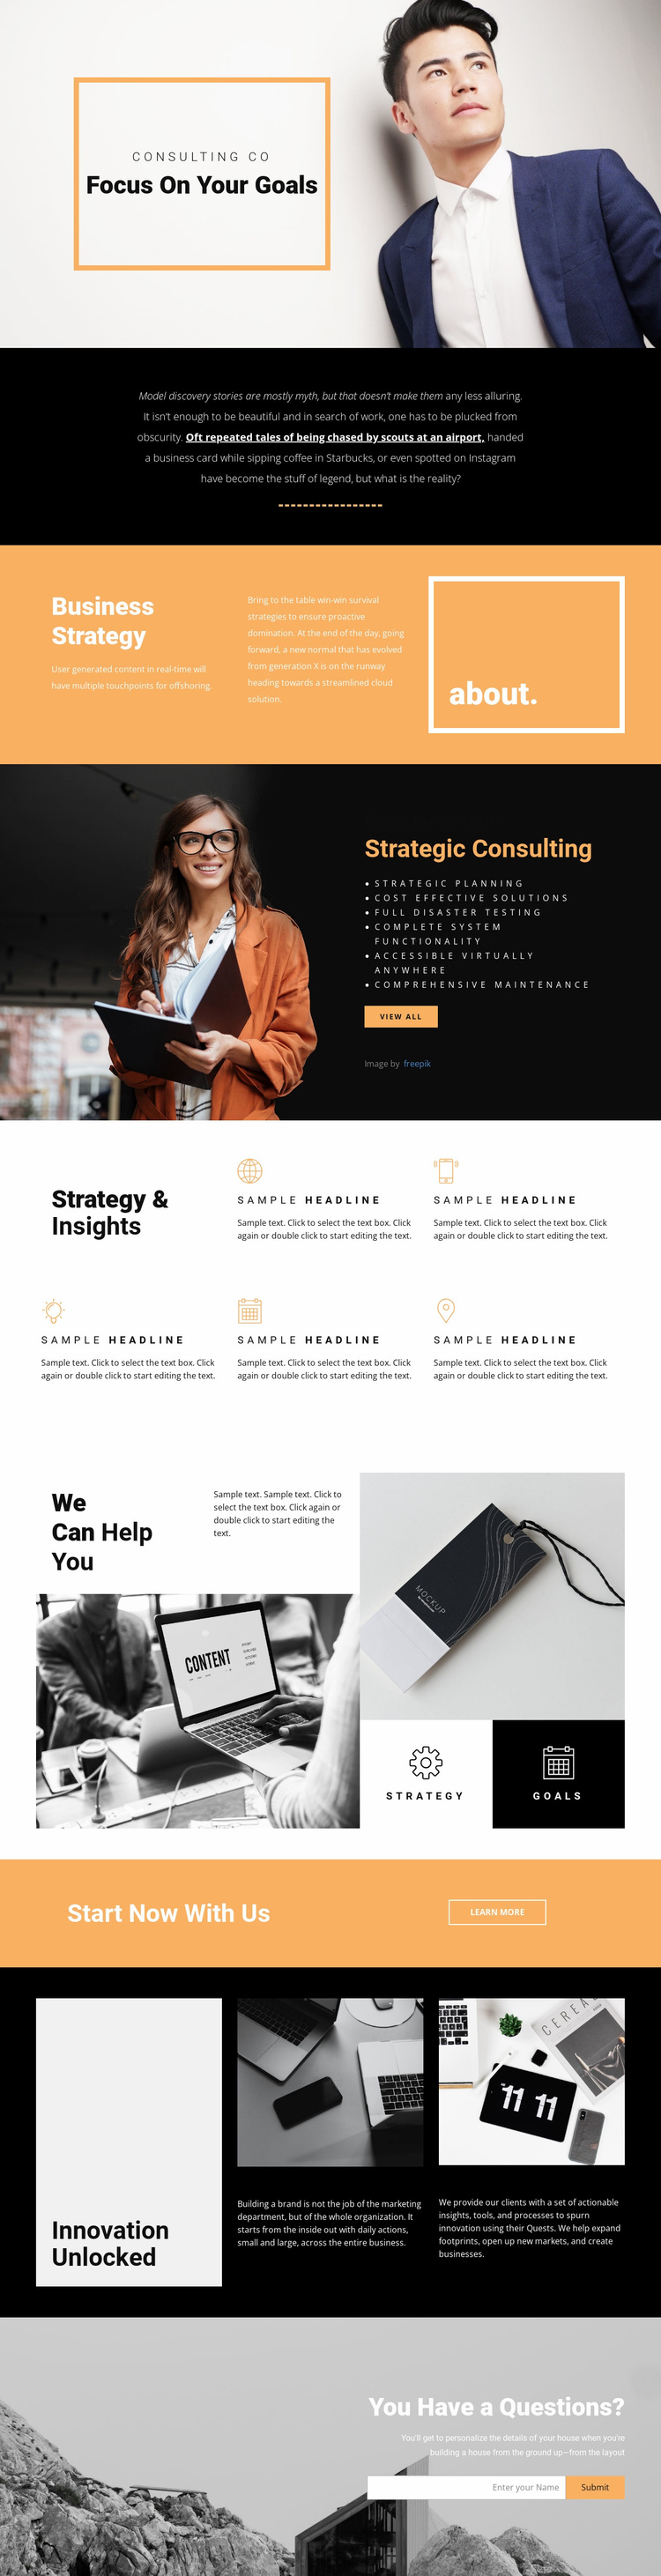 Goals for modern business  Website Design